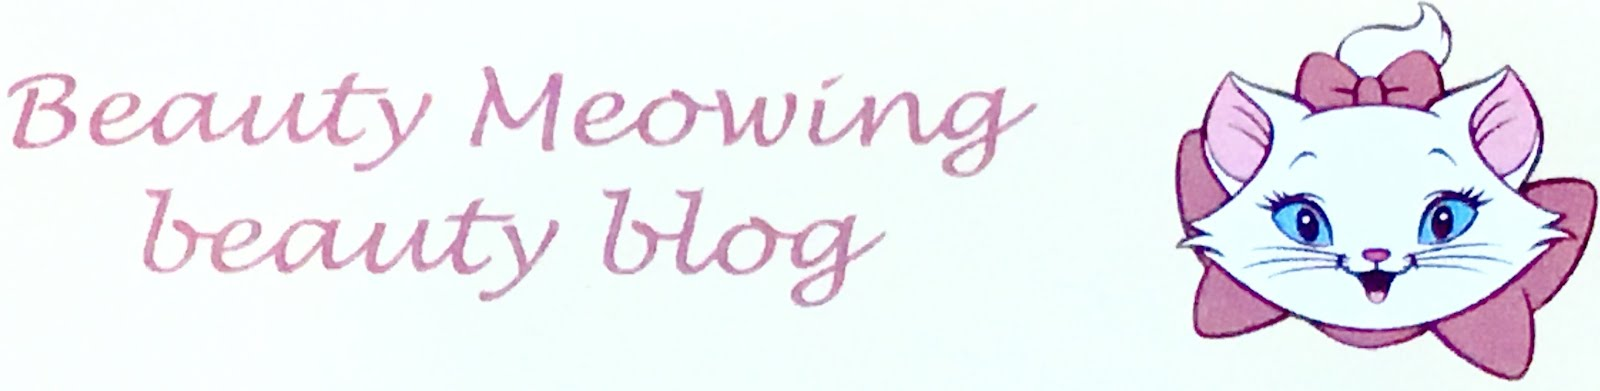 logo :)